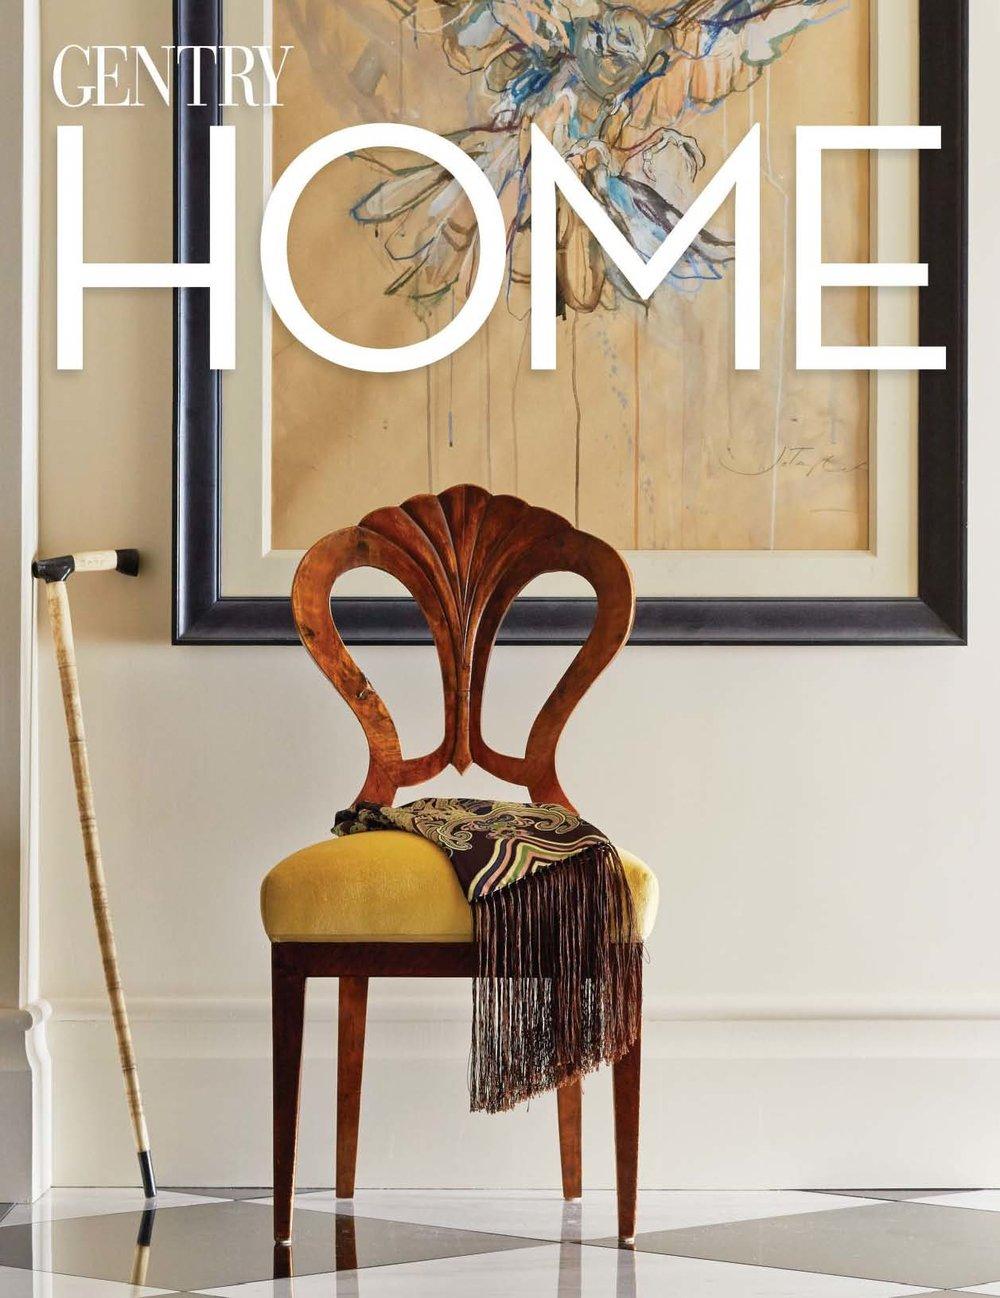 Gentry Home January_Cover.jpg